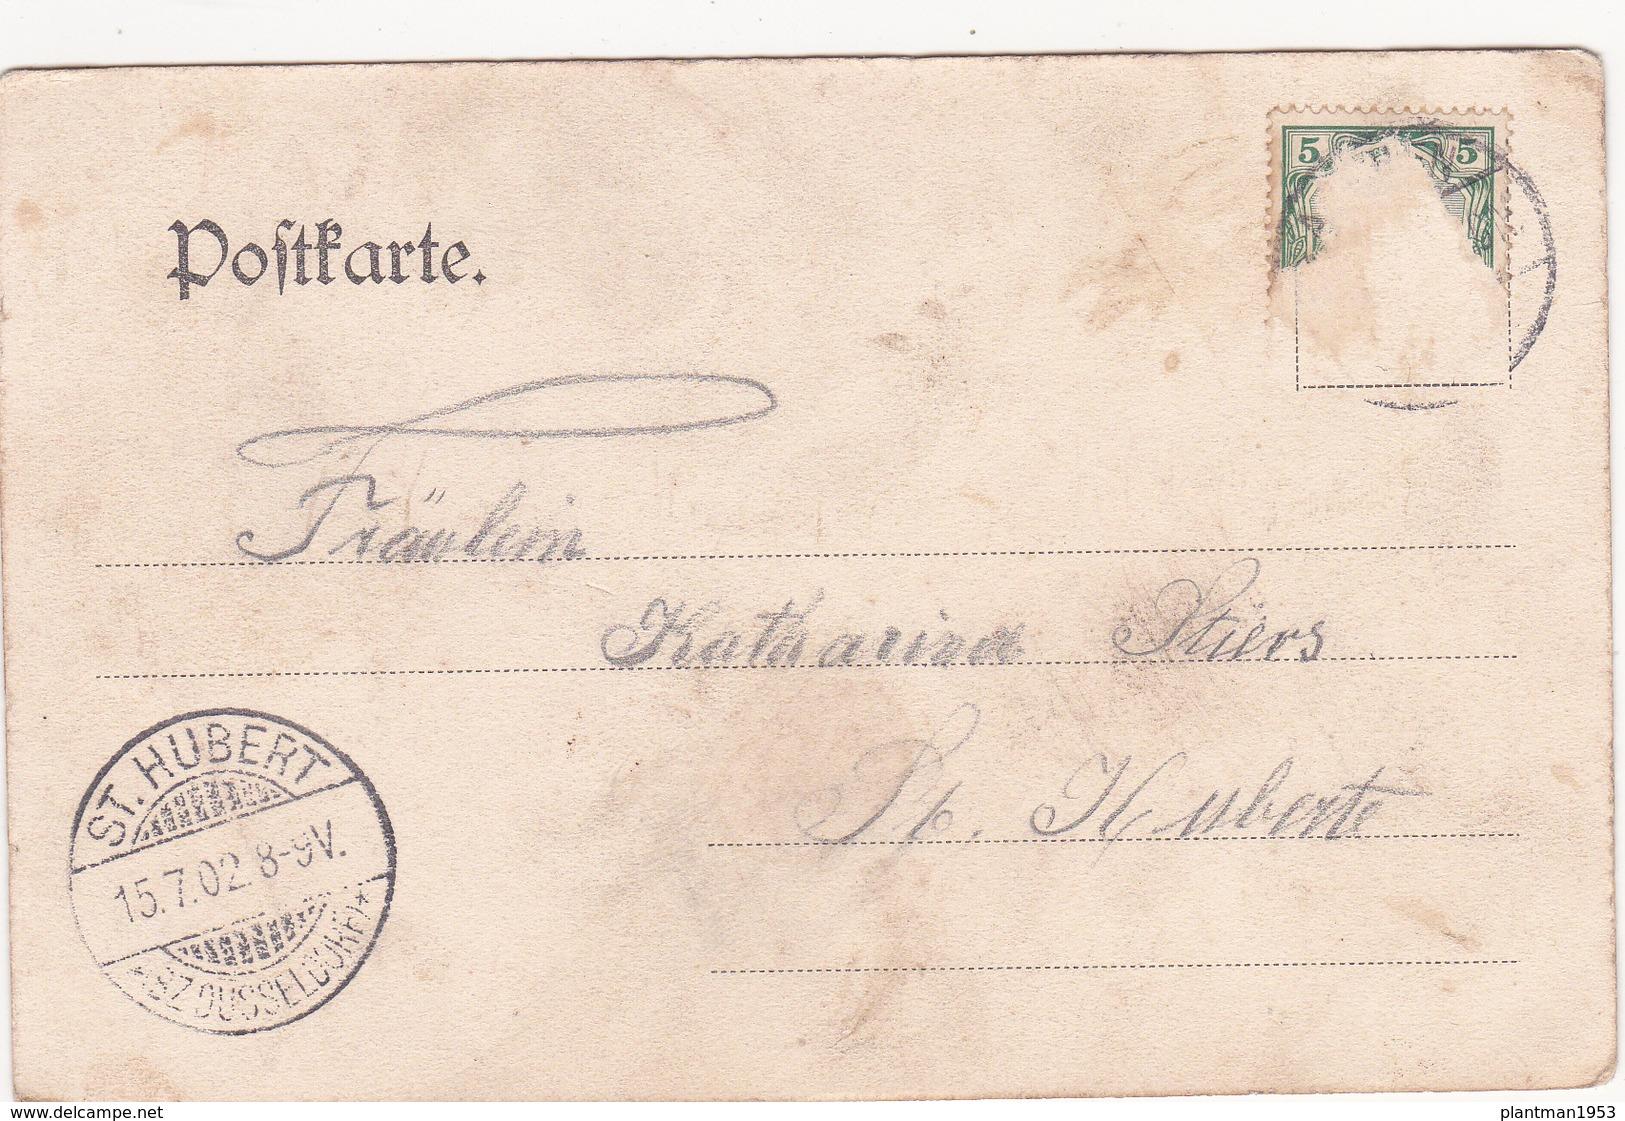 Old Postcard Of Gruss Aus Aachen, North Rhine-Westphalia, Germany,Posted,R38. - Aachen